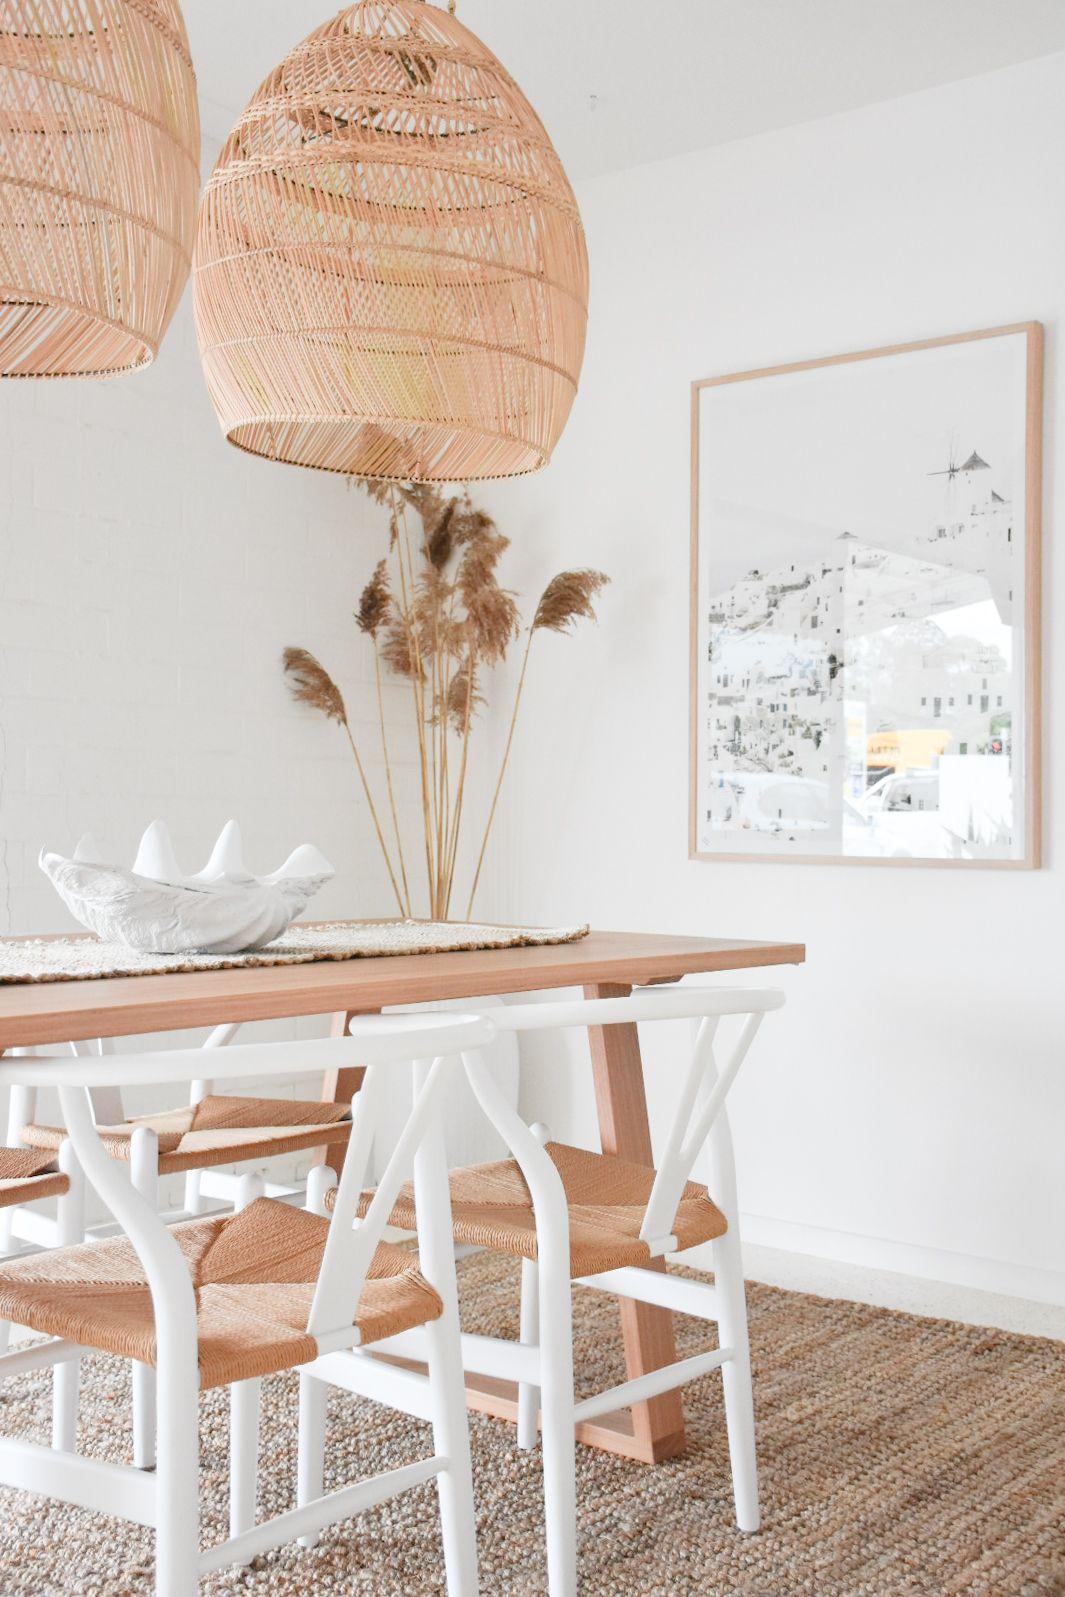 Wishbone Designer Replica Chair in 2020 Dining room